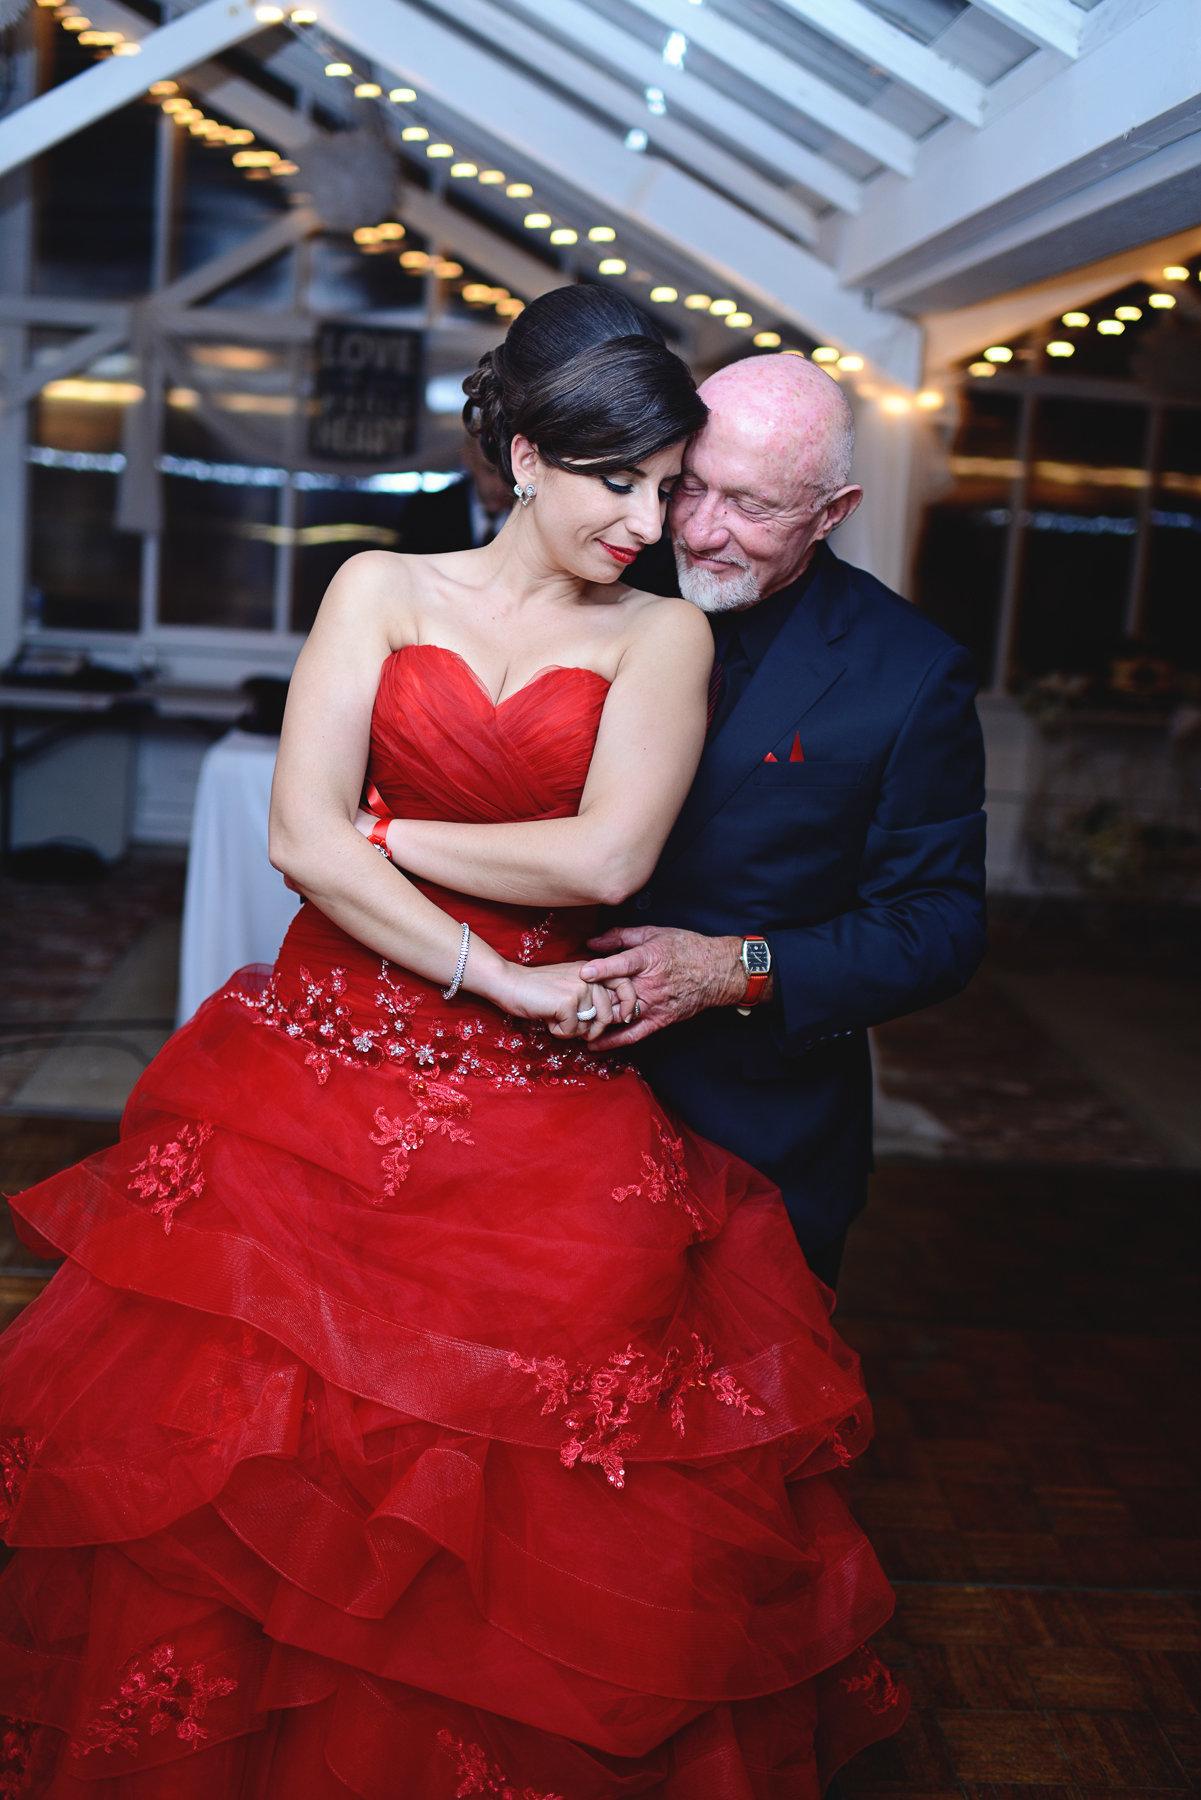 malibu wedding photographer photos celebrity wedding photographer bryan newfield photography ruth mike 42